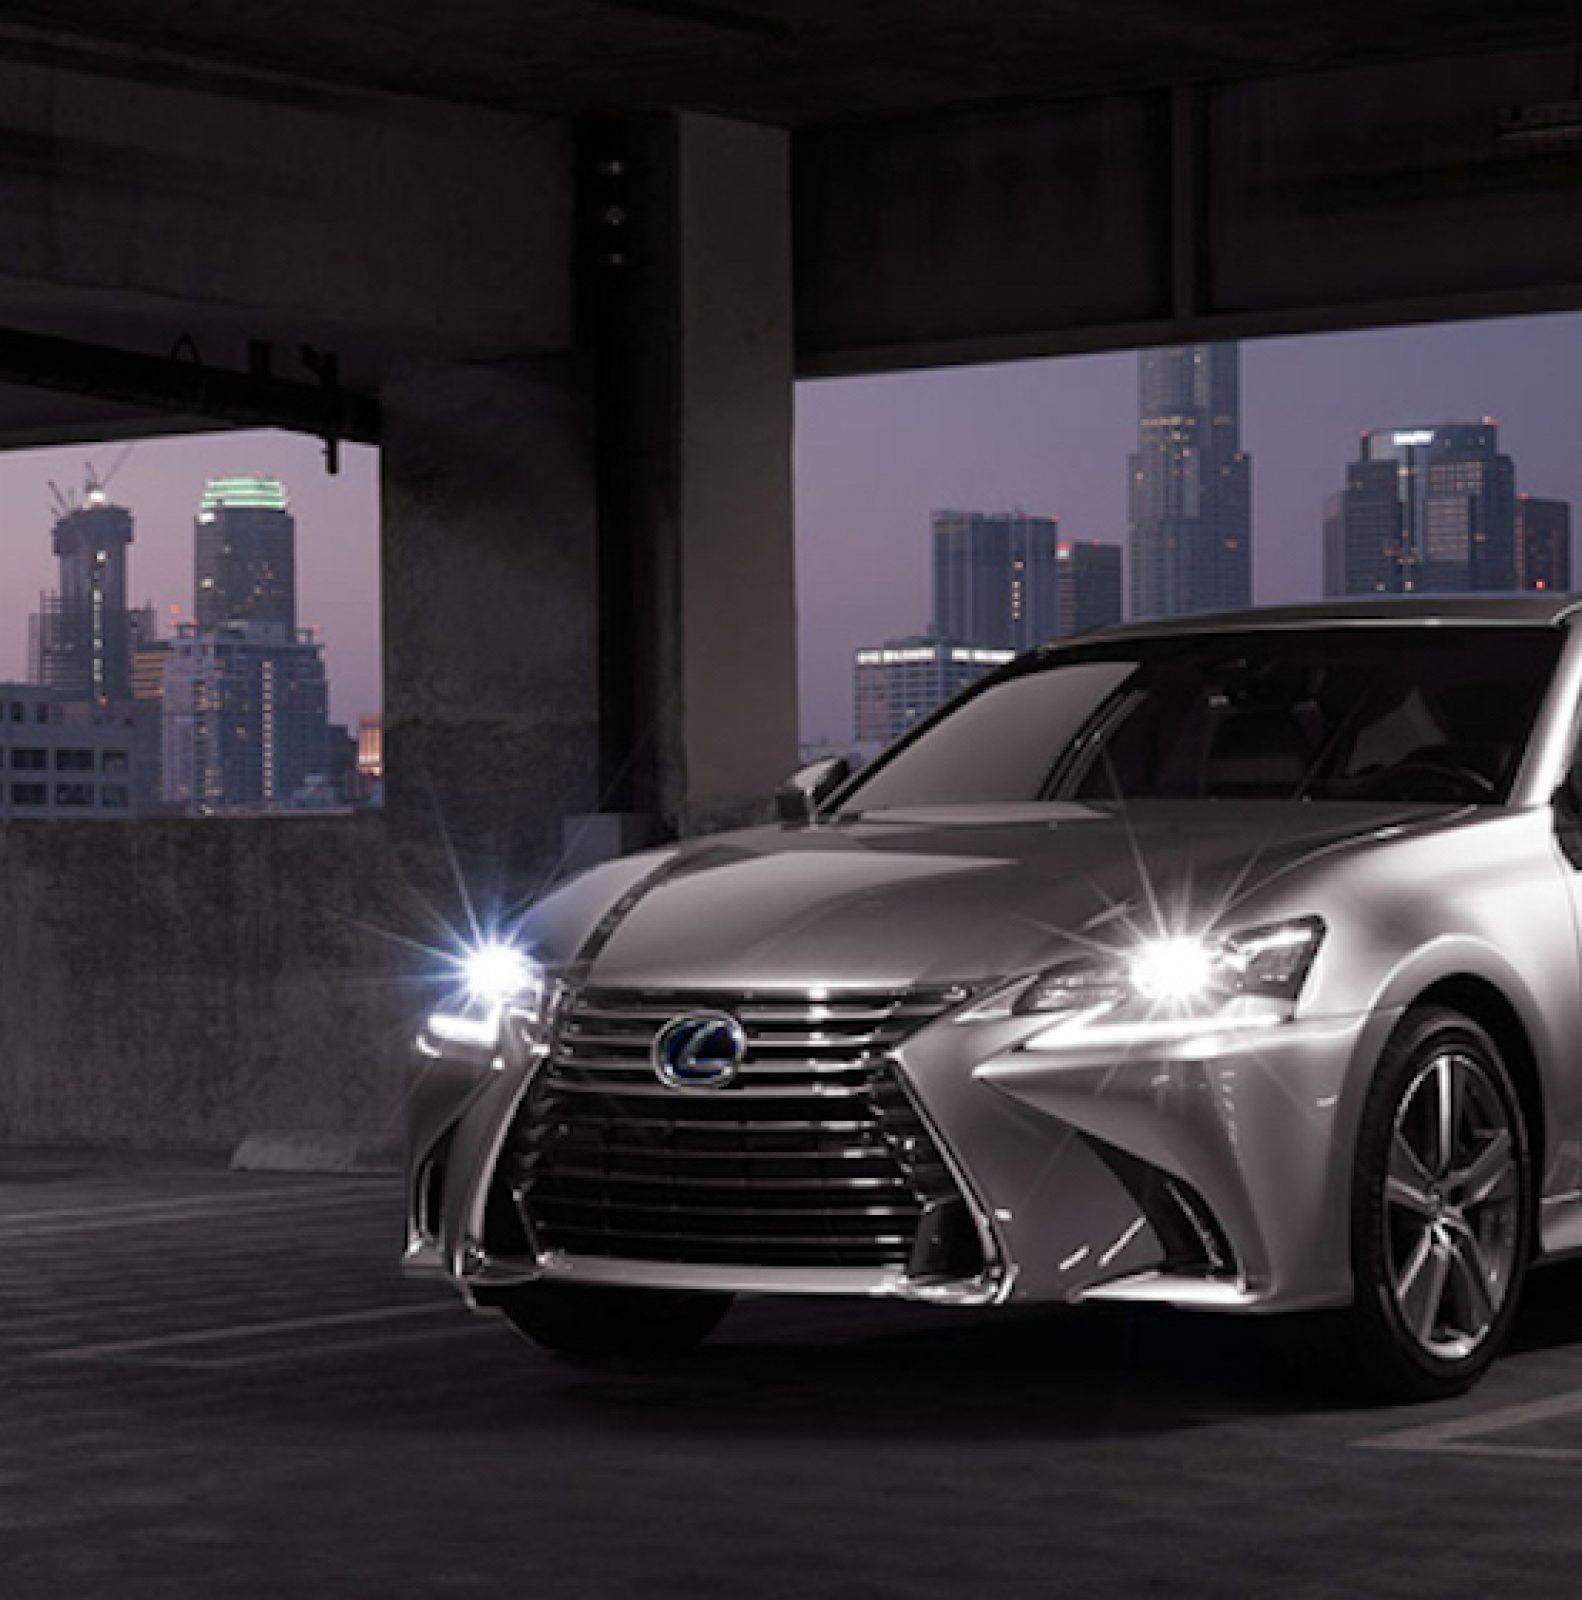 Lexus-gs300h-06